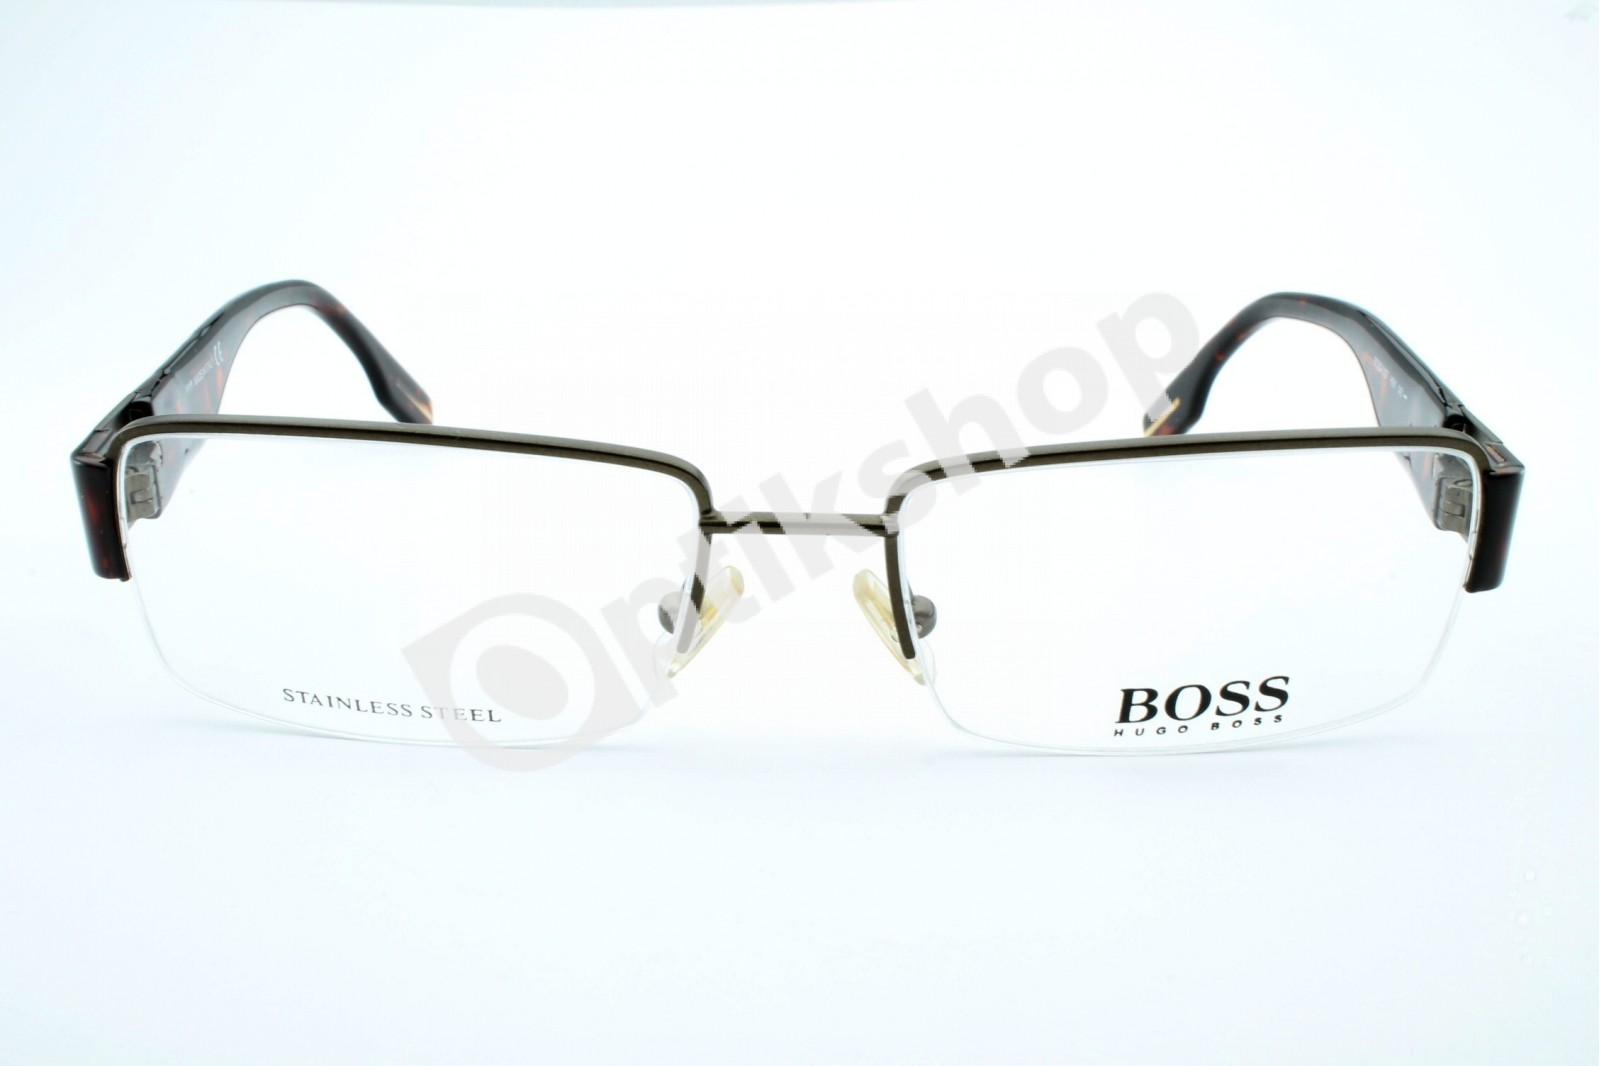 Hugo Boss szemüveg  Hugo Boss szemüveg ... 0eff307823